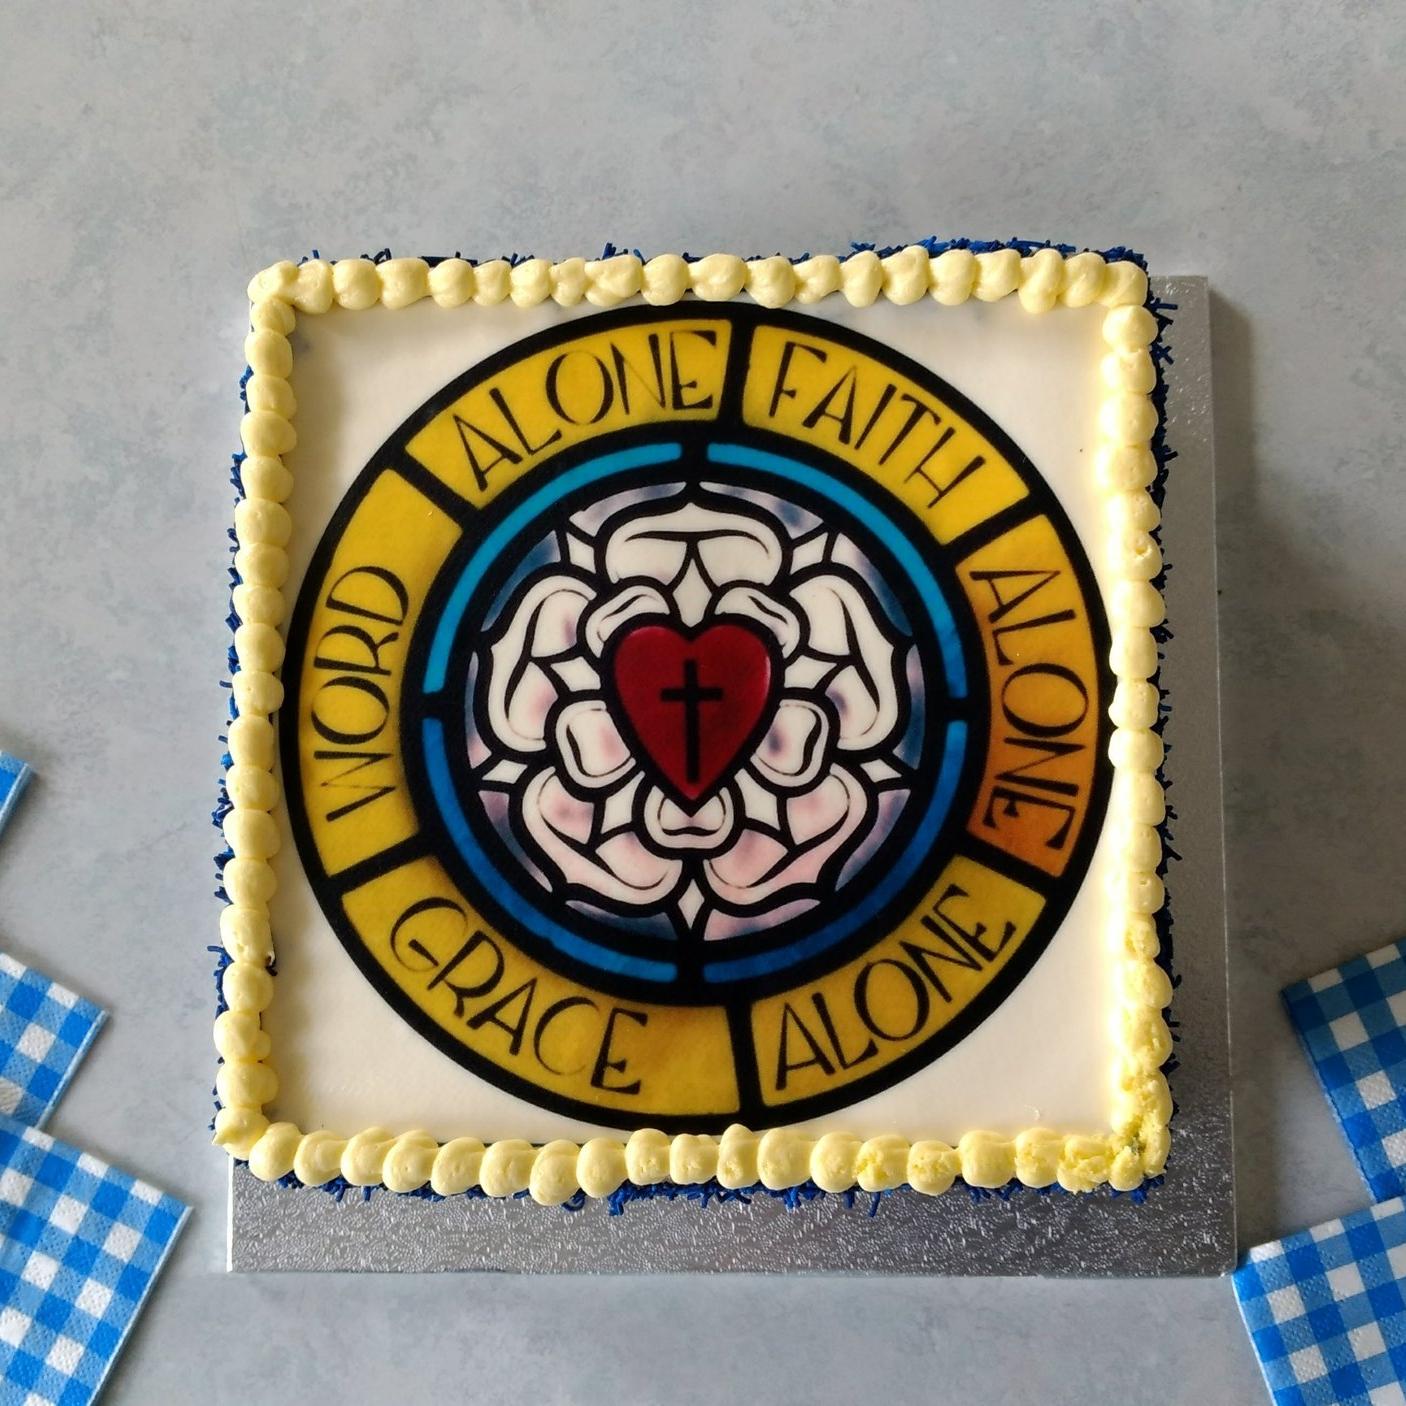 Reformation cake!